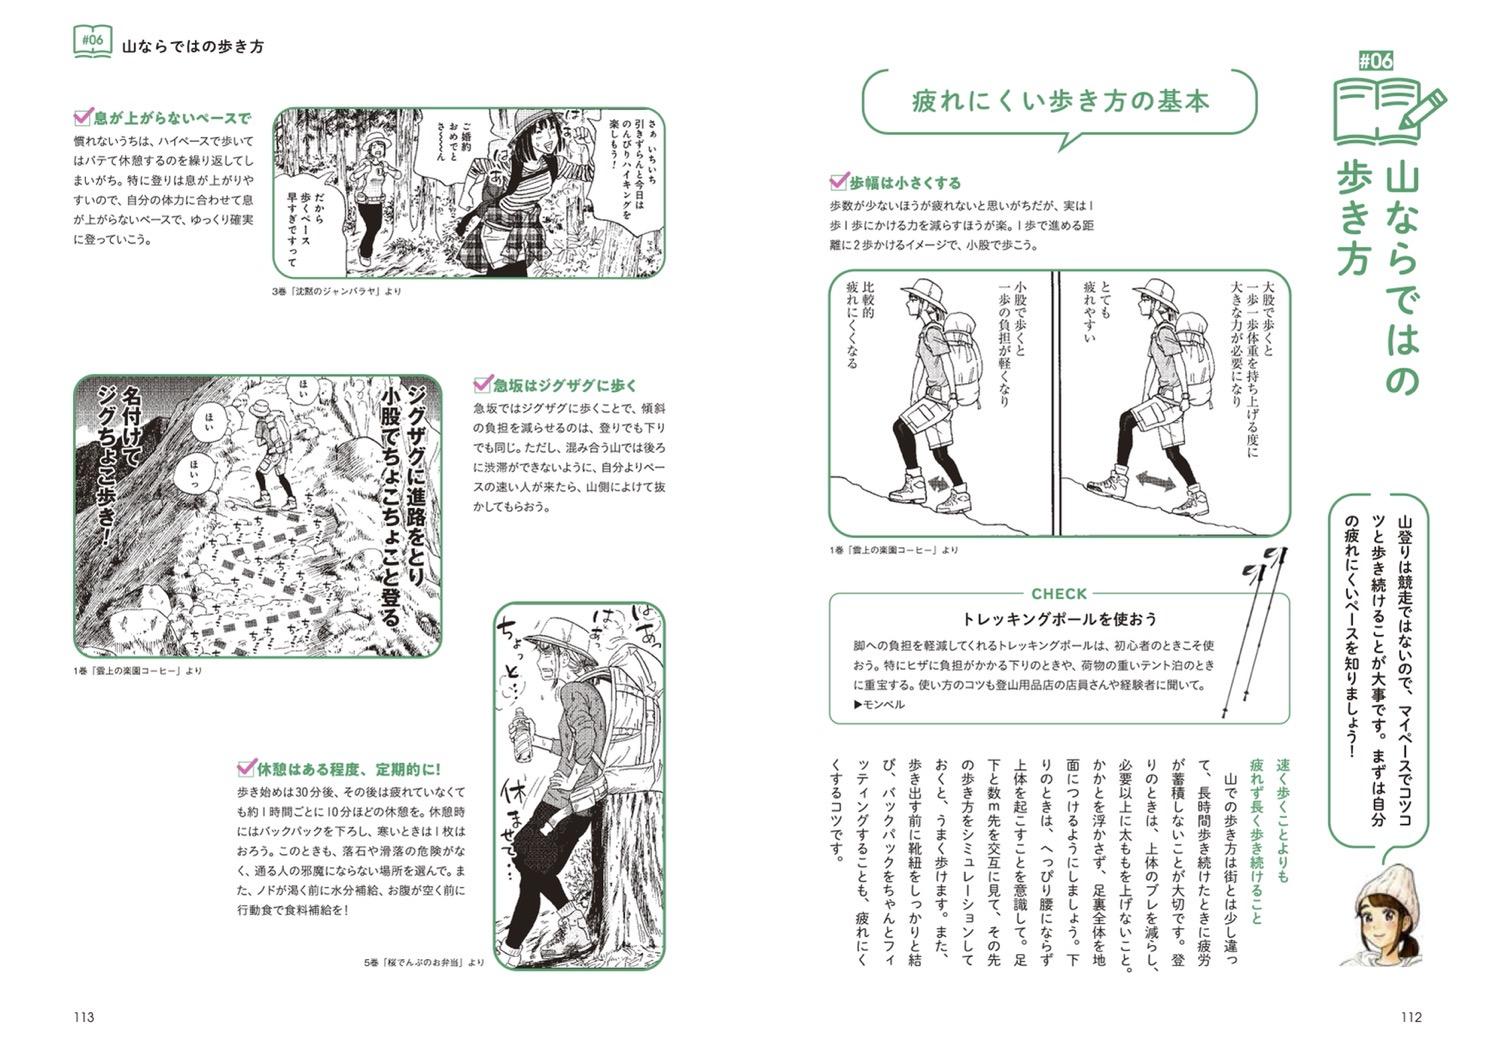 Yamashoku ayumi book 9 04 04